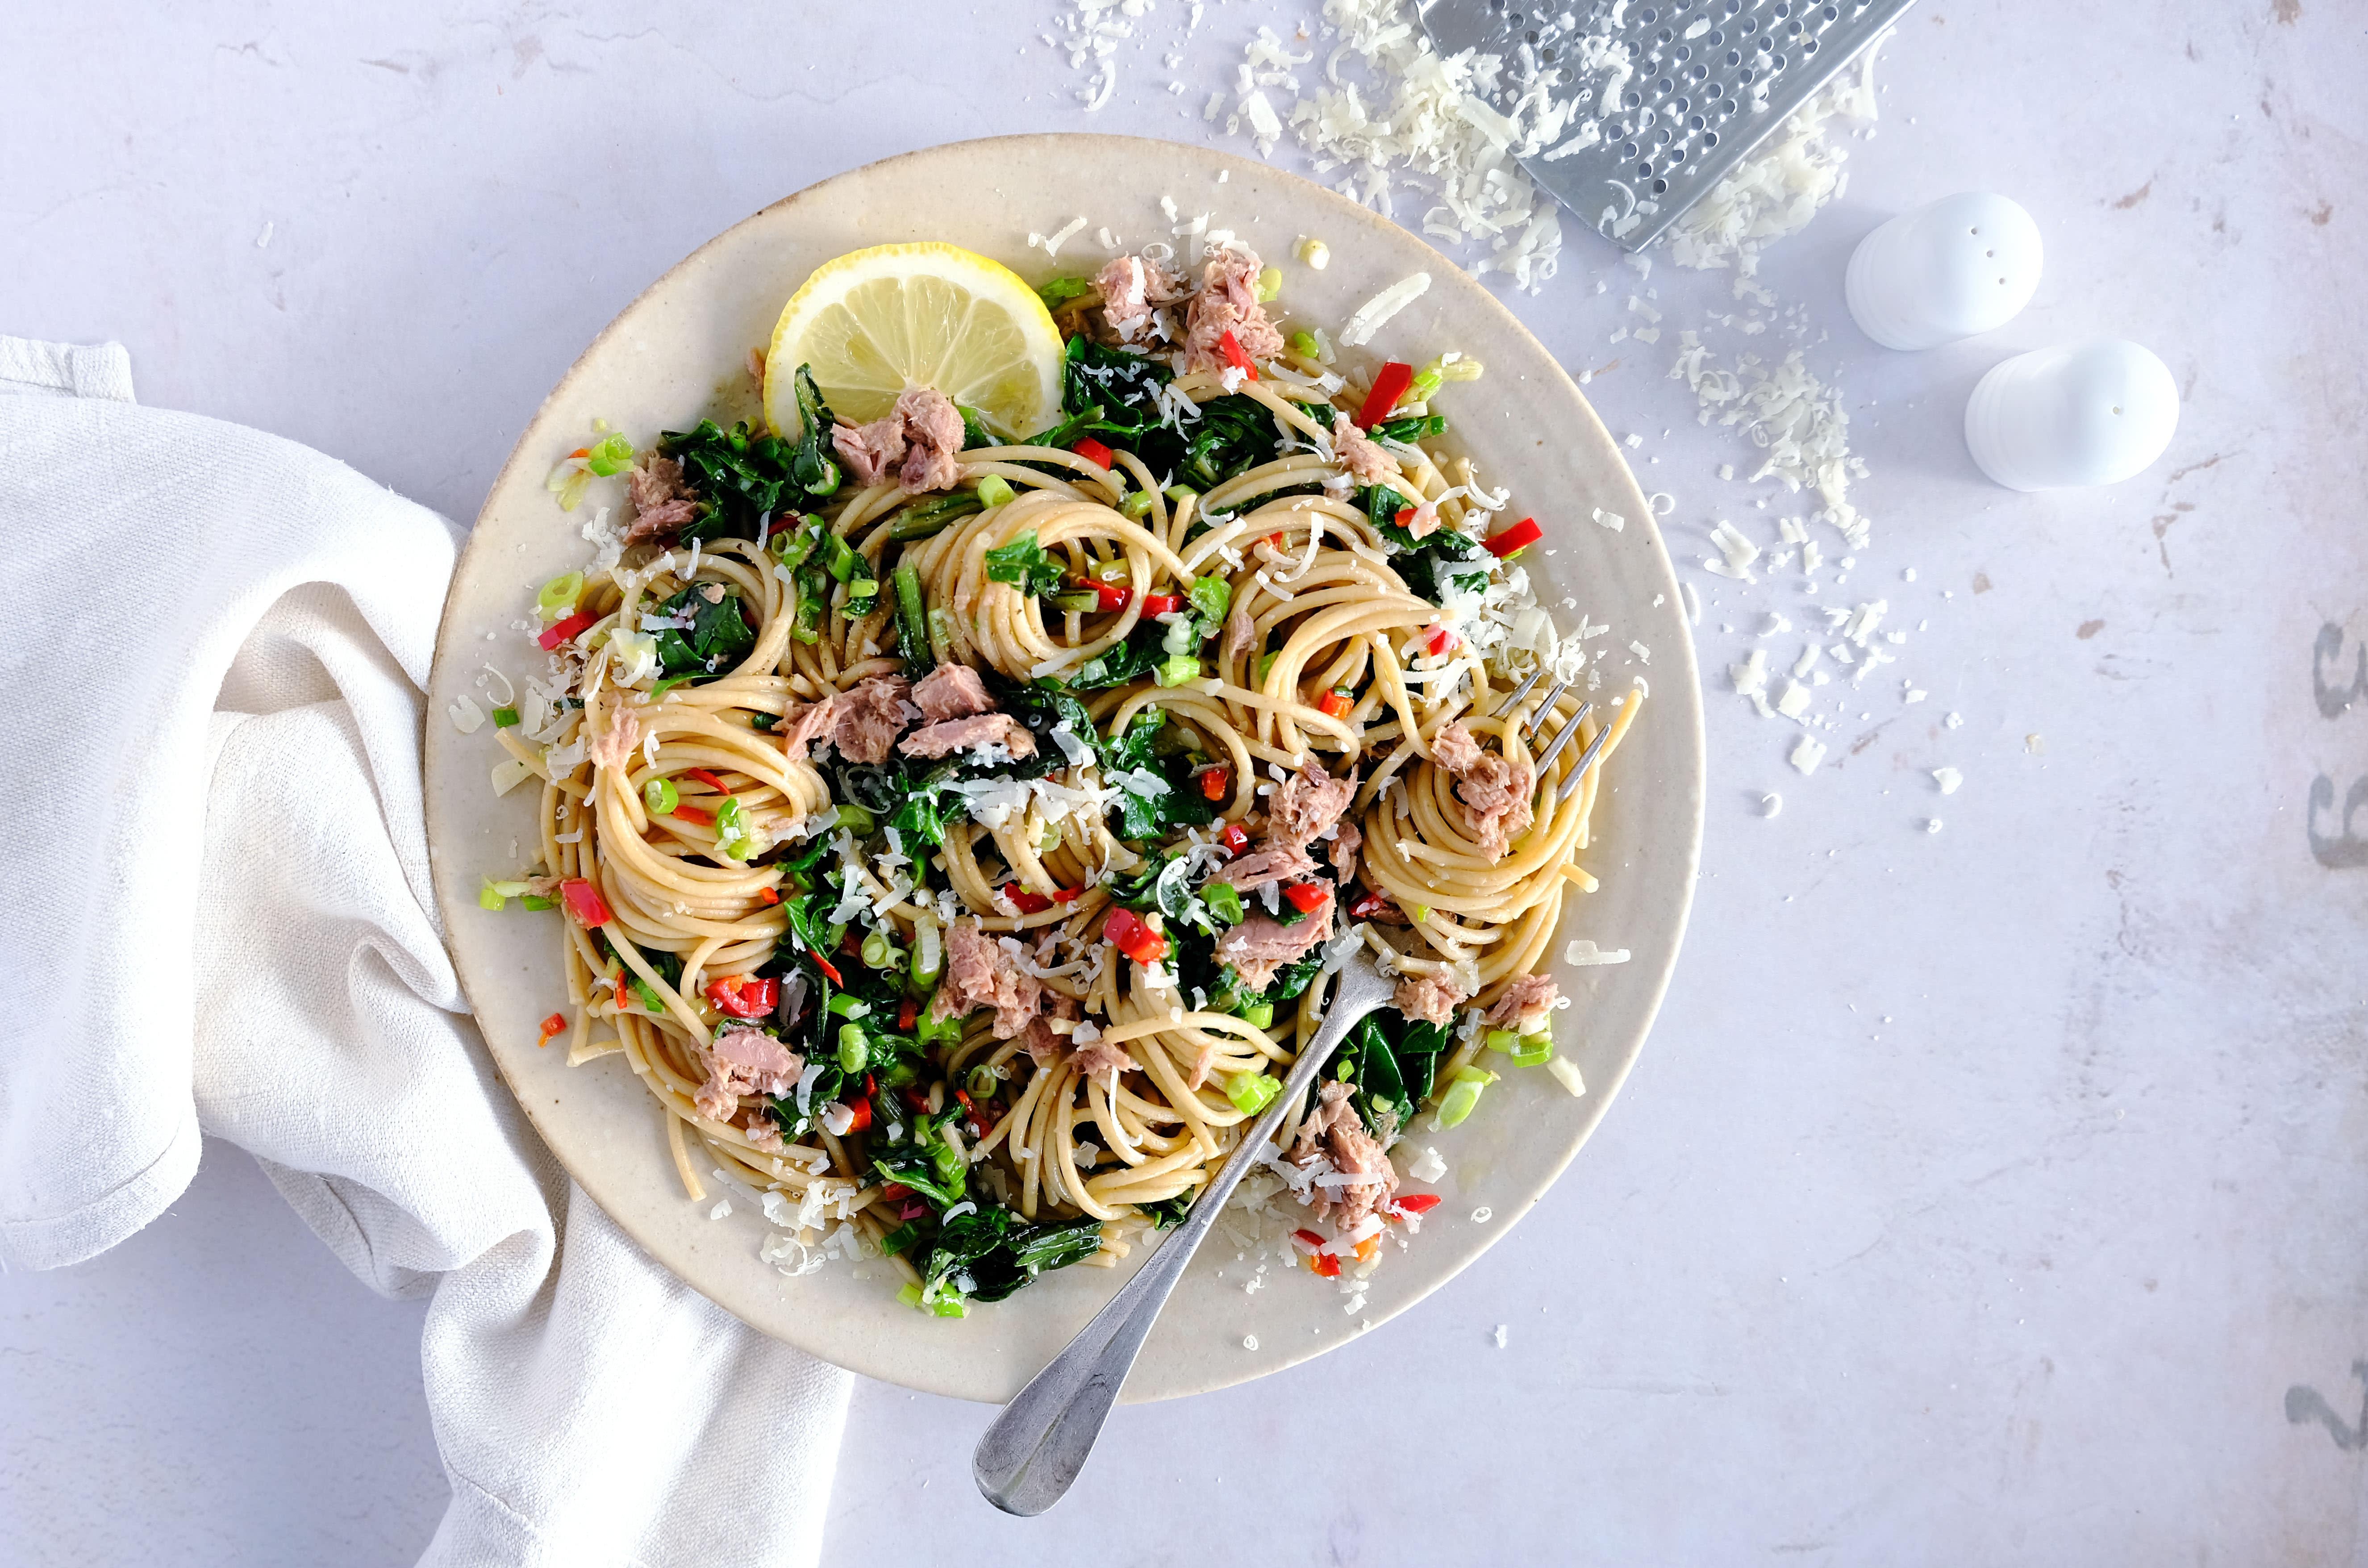 Simple Tuna Wholewheat Spaghetti with Spinach